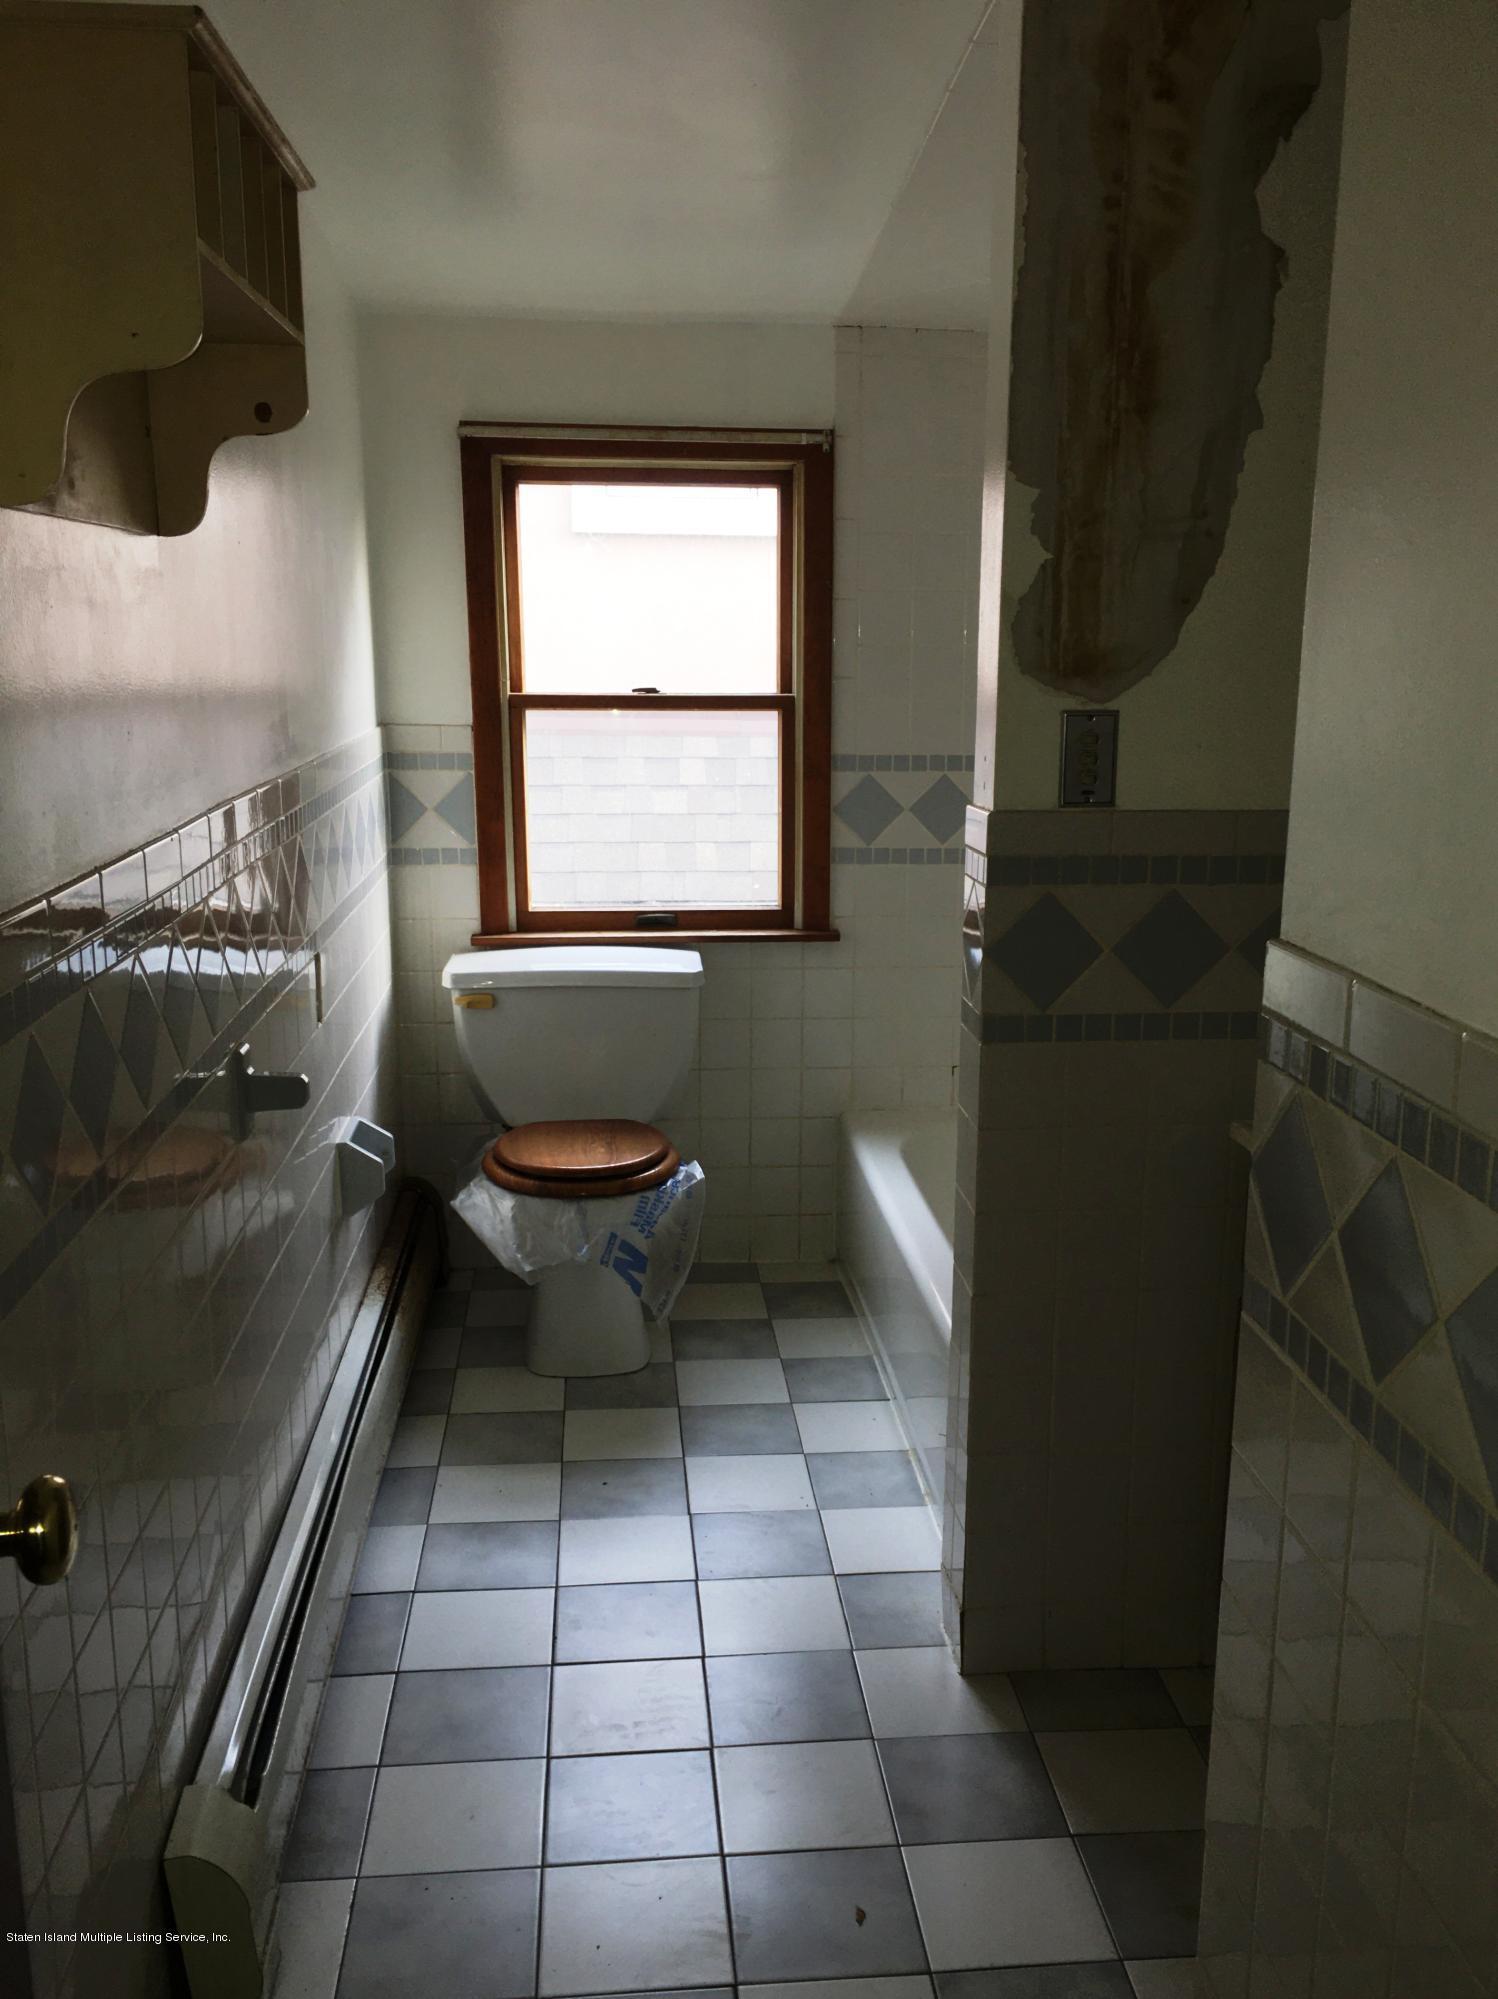 312 Isabella Staten Island,New York,10306,United States,4 Bedrooms Bedrooms,8 Rooms Rooms,2 BathroomsBathrooms,Residential,Isabella,1134311